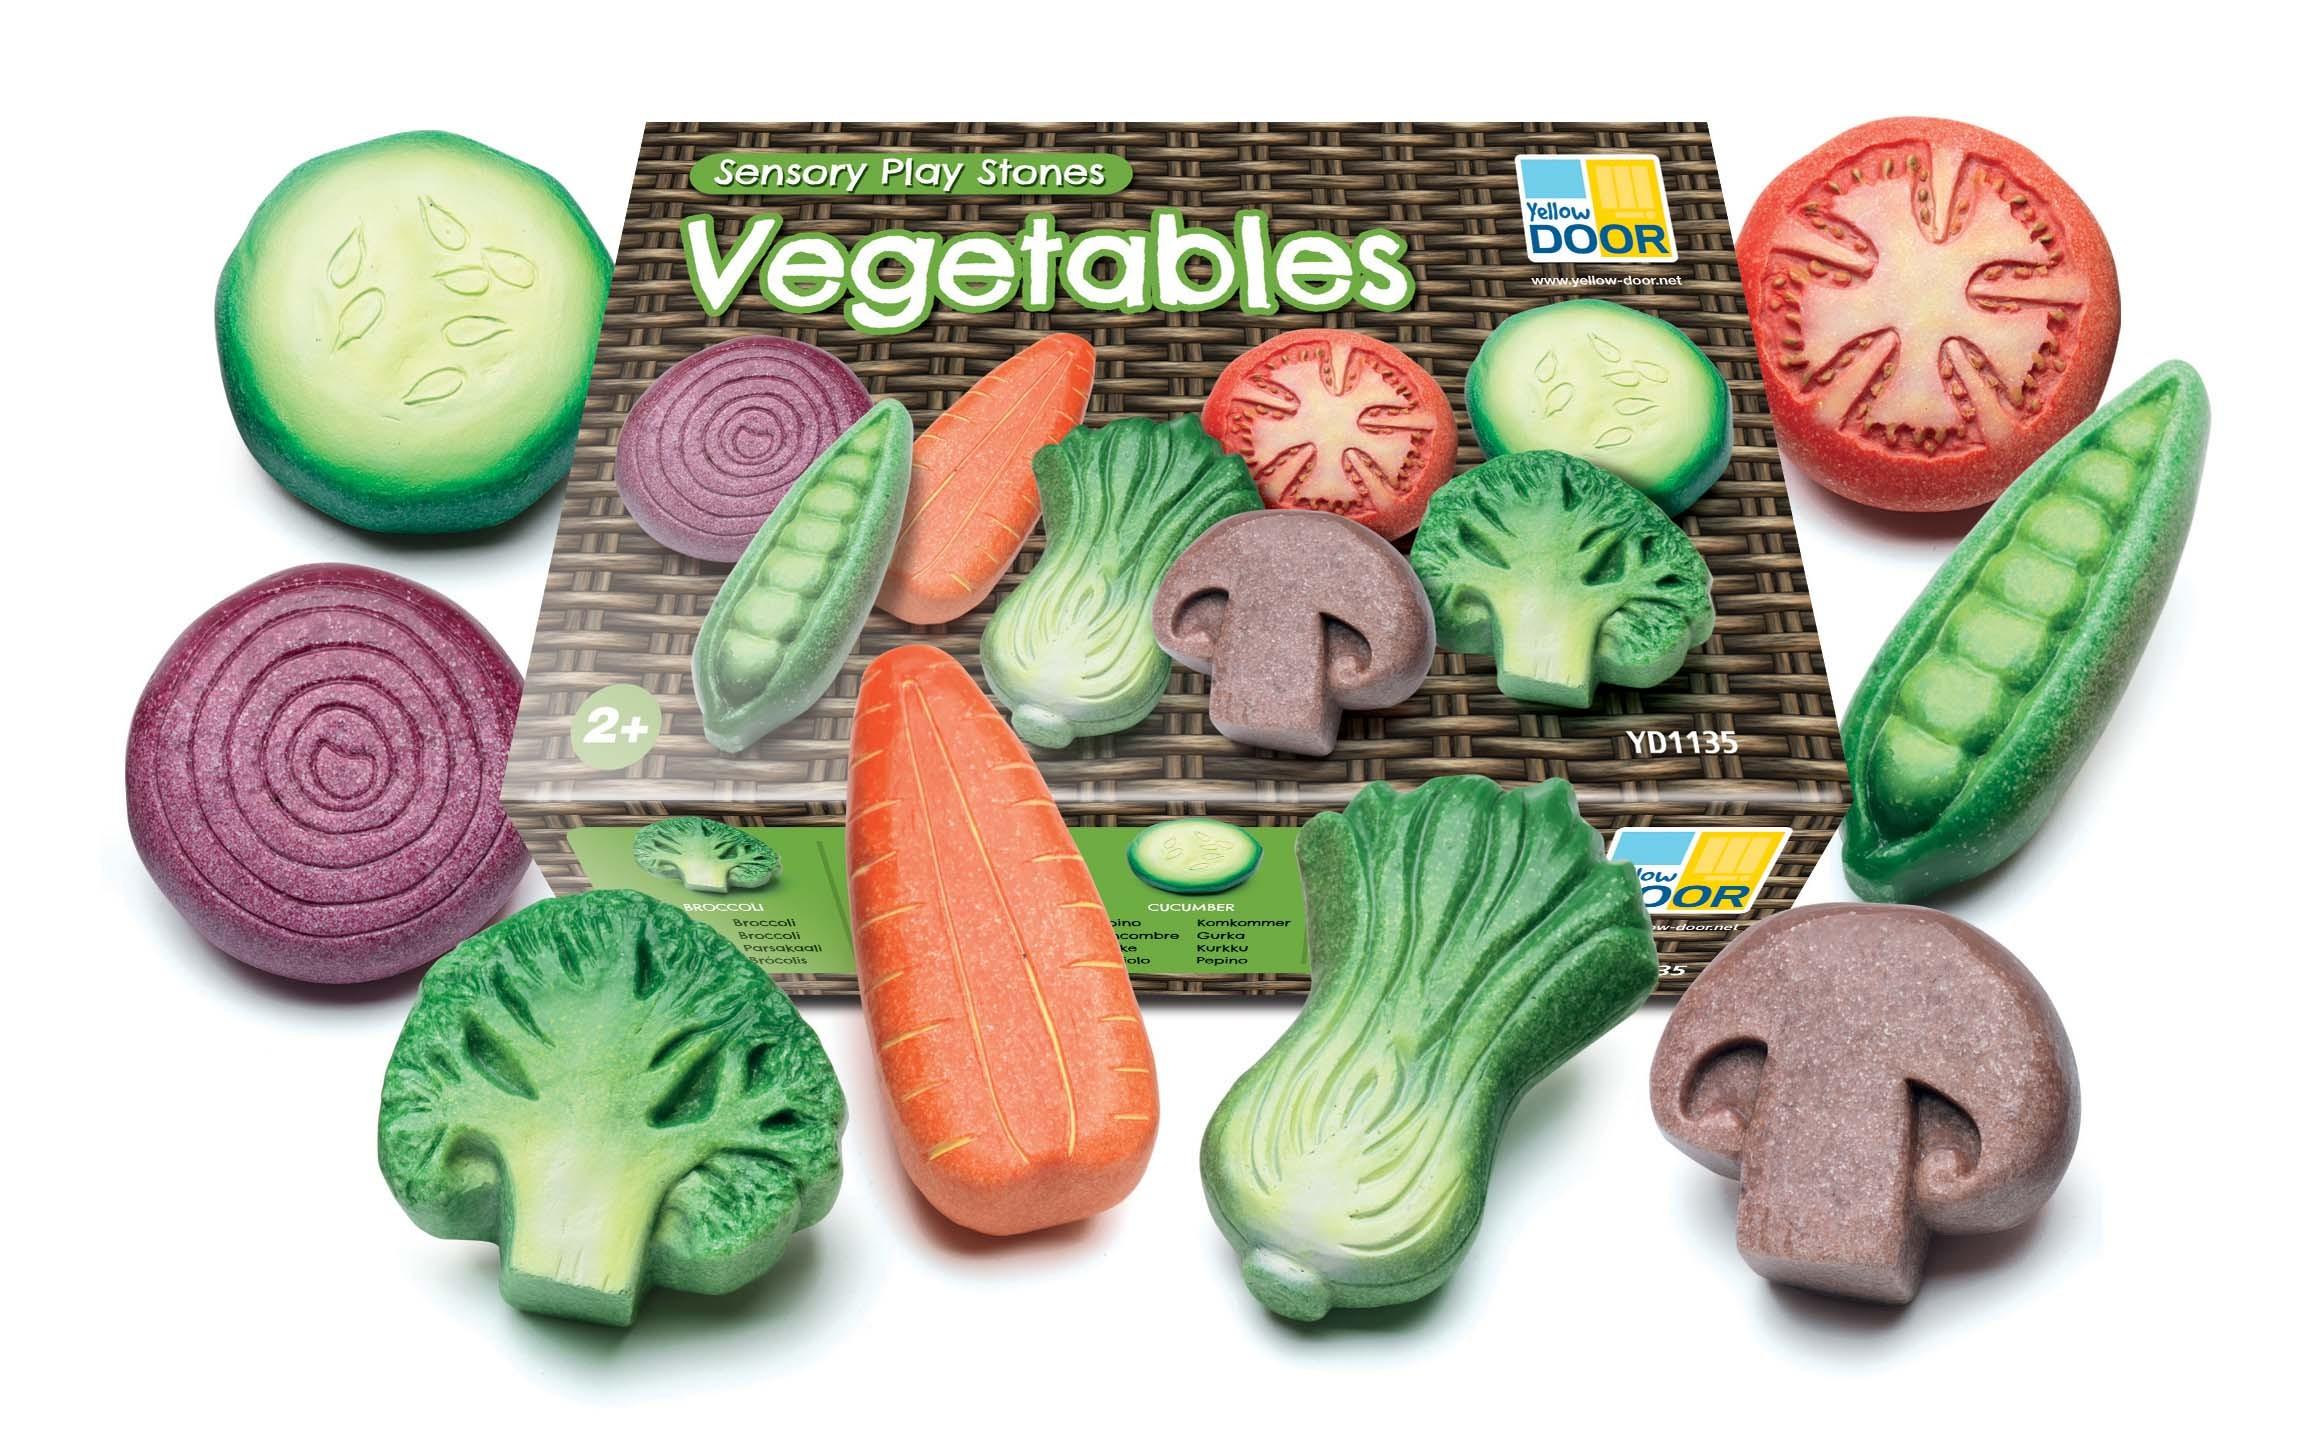 Vegetable Sensory Play Stones